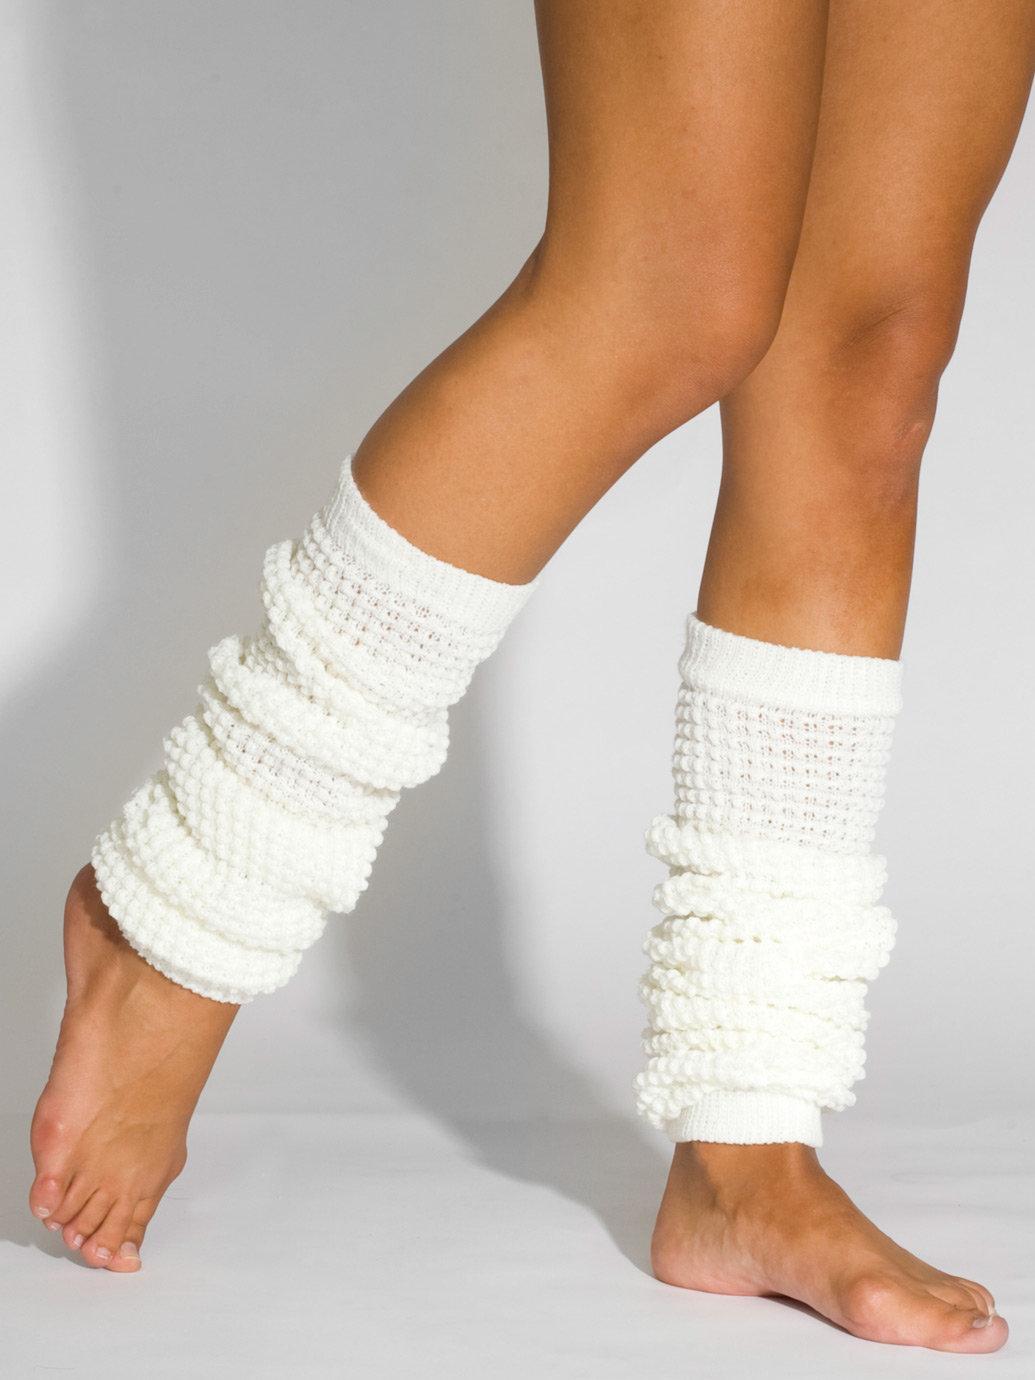 American Apparel Long Leg Warmer In White (Cru00e8me) | Lyst